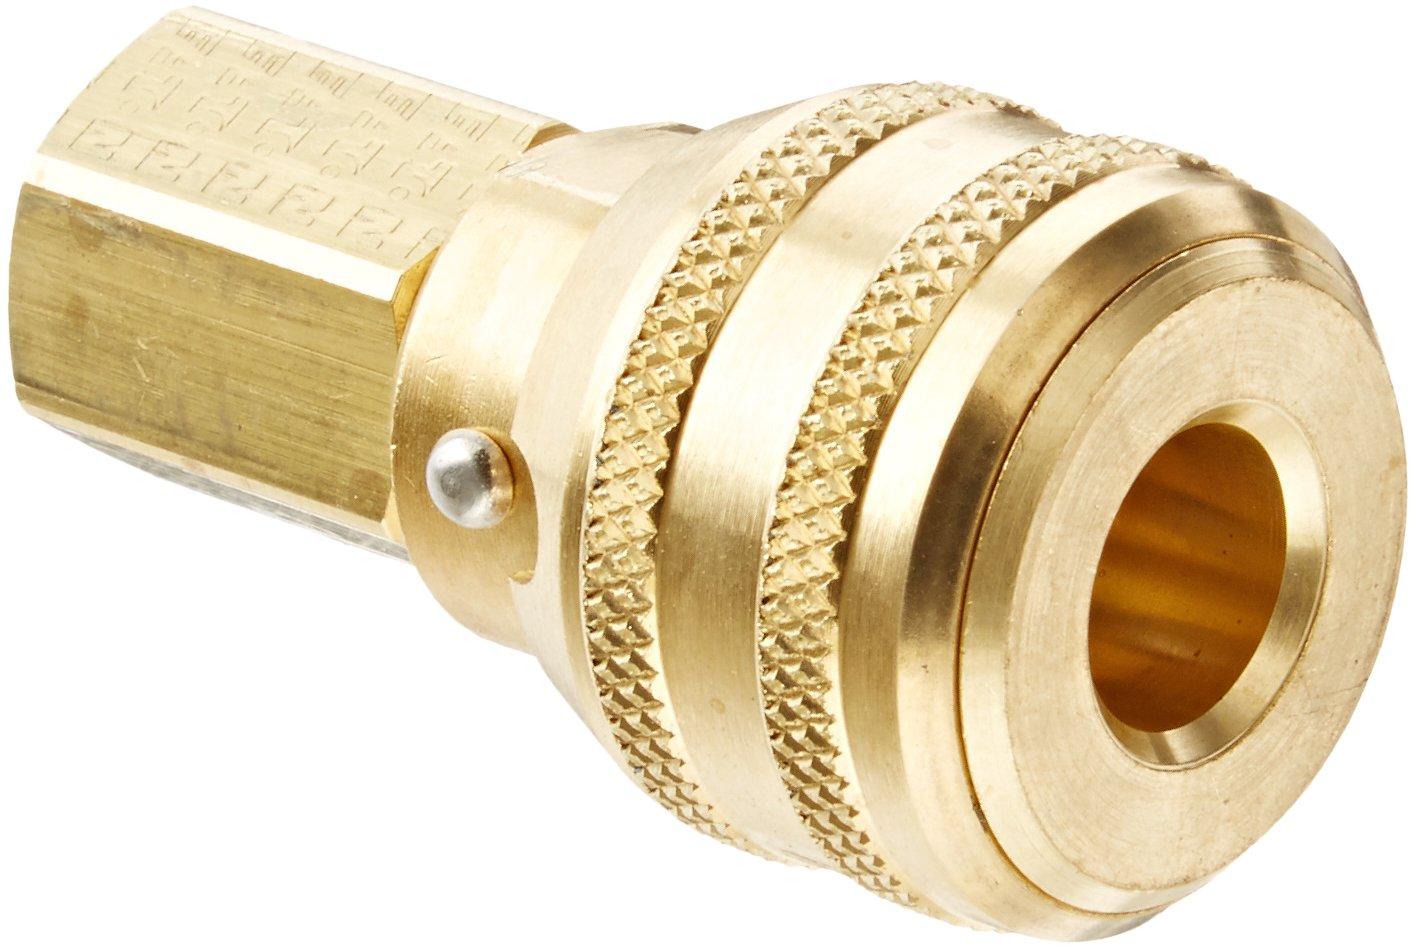 1//4 Body 1//4-18 NPTF Female Sleeve Lock Socket with Brass Valve Fluorocarbon Seal 1//4 Port Size Eaton Hansen 3000BVSL143 Brass ISO-B Interchange Pin Lock Pneumatic Fitting